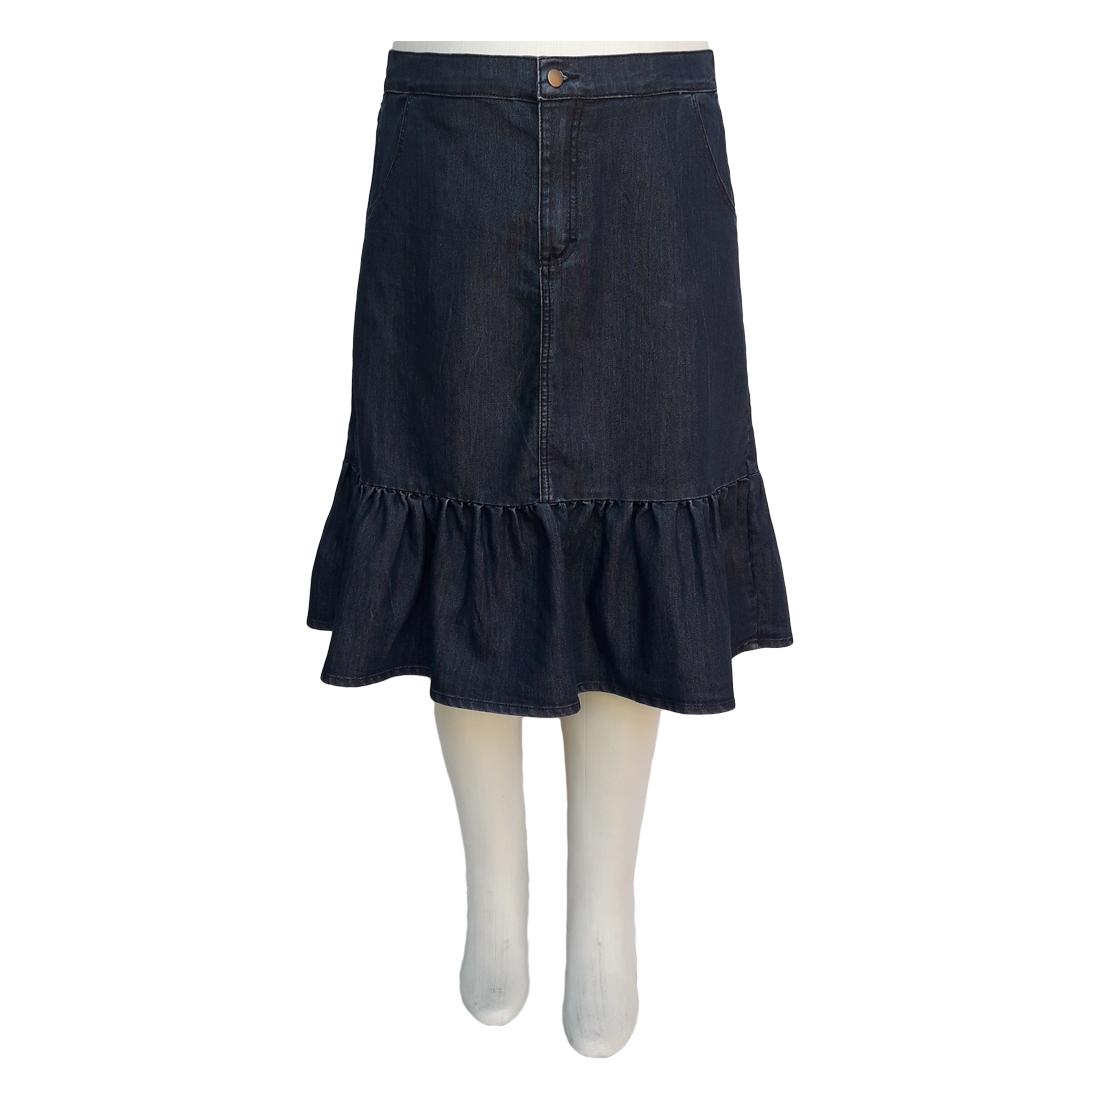 Saia Jeans Evasê Barra Franzida Moda Evangélica Plus Size